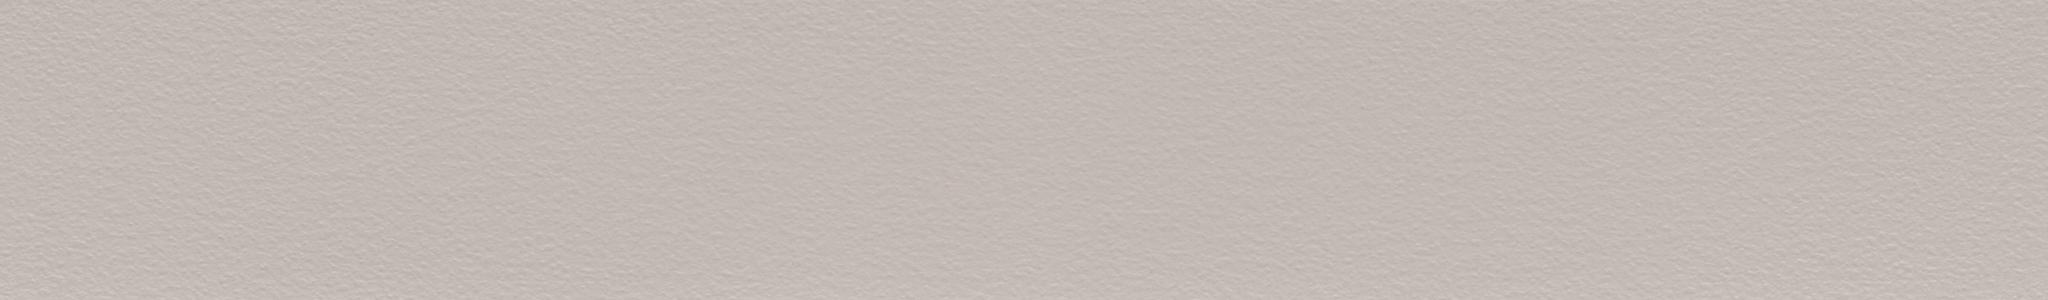 HU 128049 ABS Edge Cashmere Soft Pearl 107